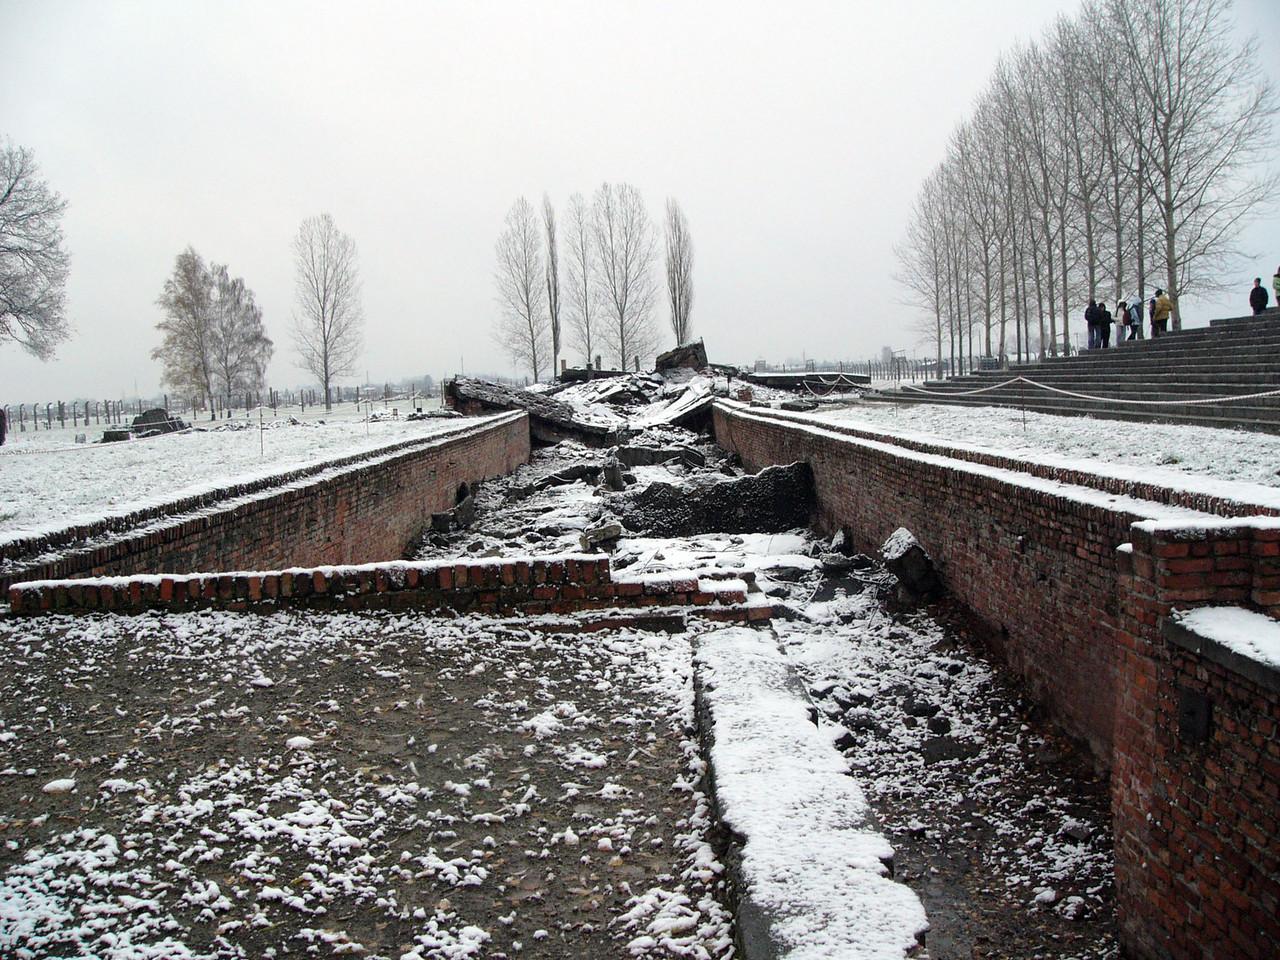 Crematorium at Auschwitz 2, destroyed by Nazis before liberations